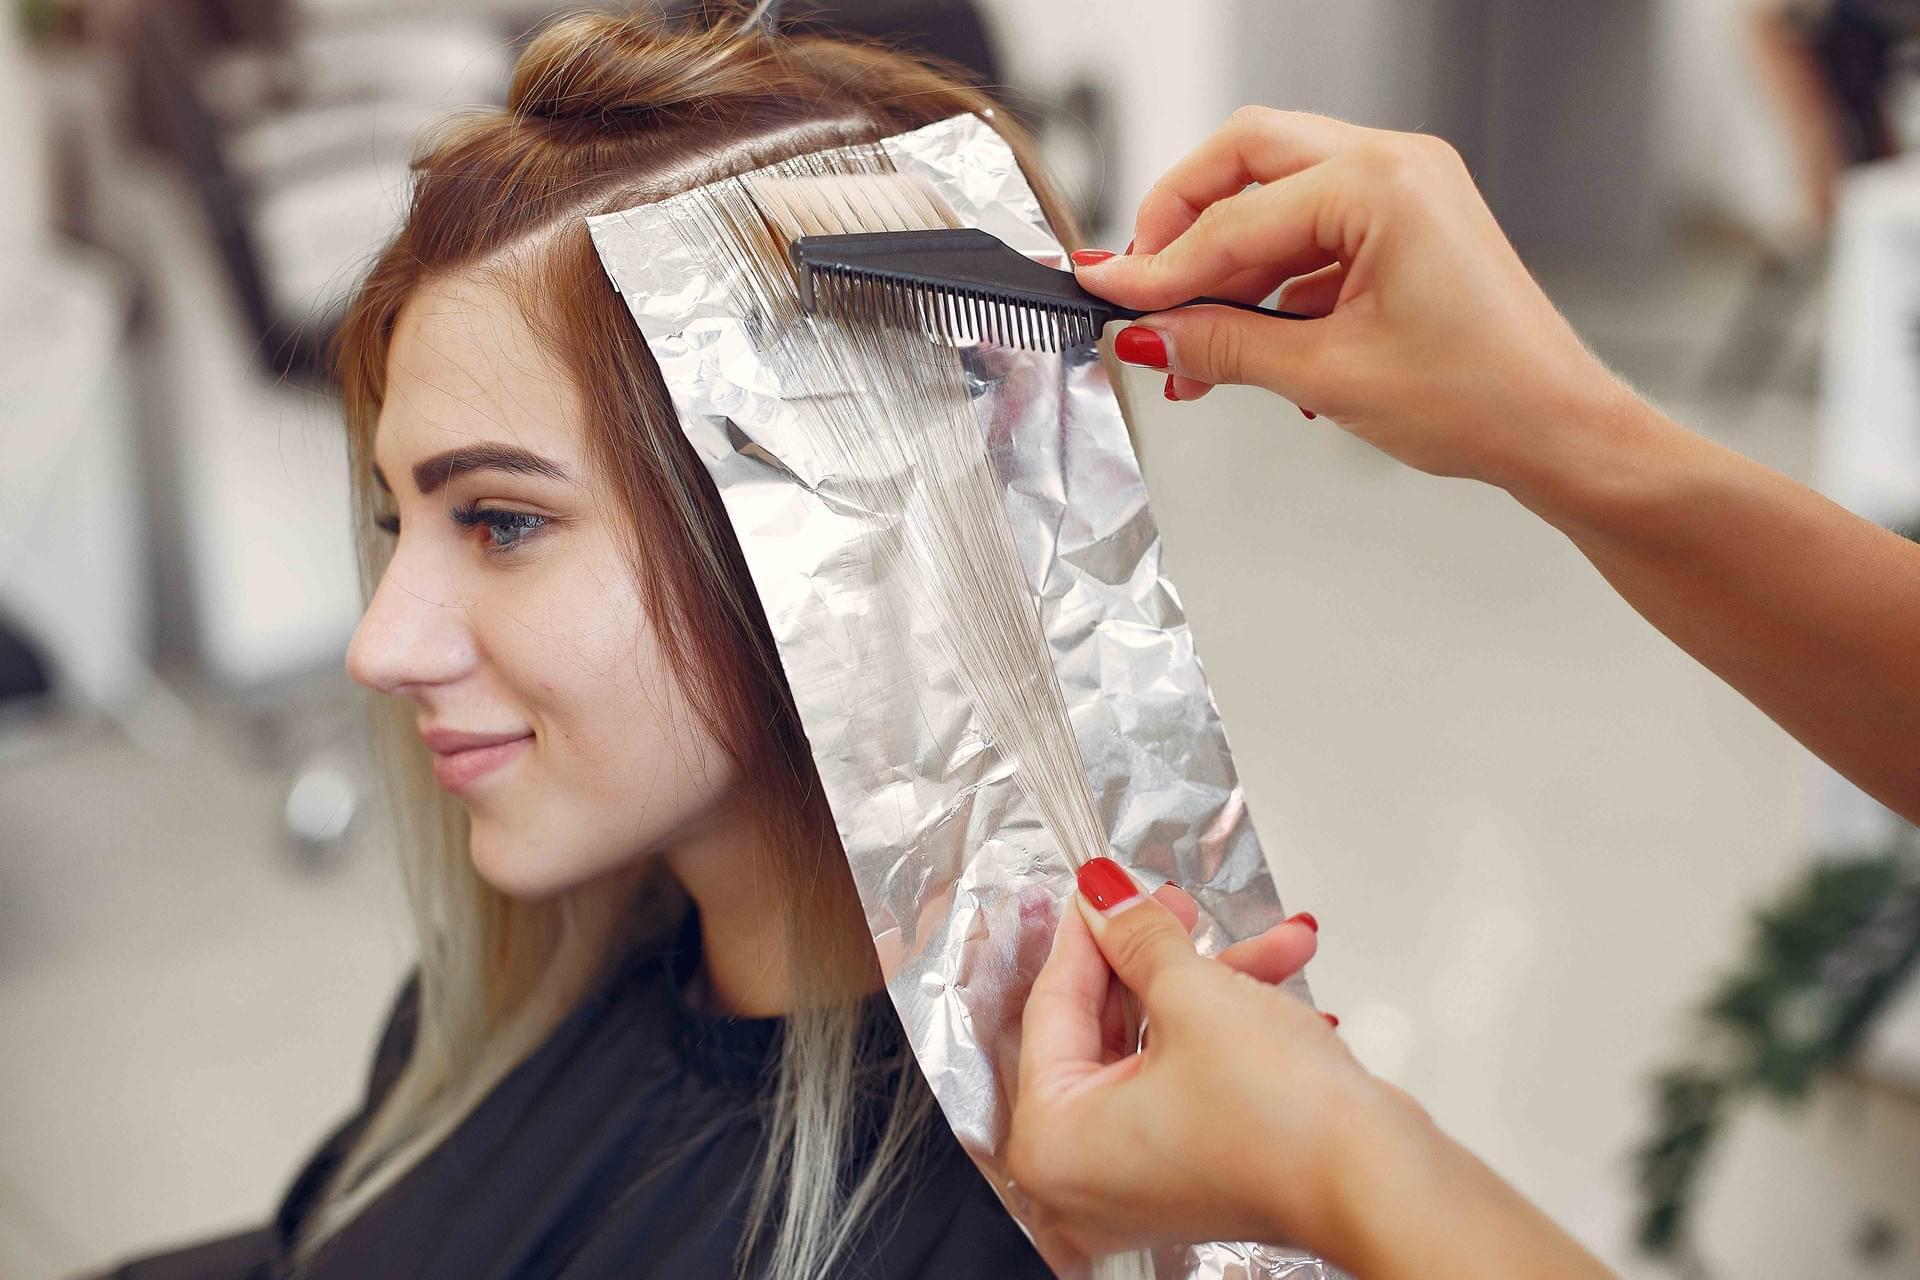 Mujer - Mechas plata y lavado